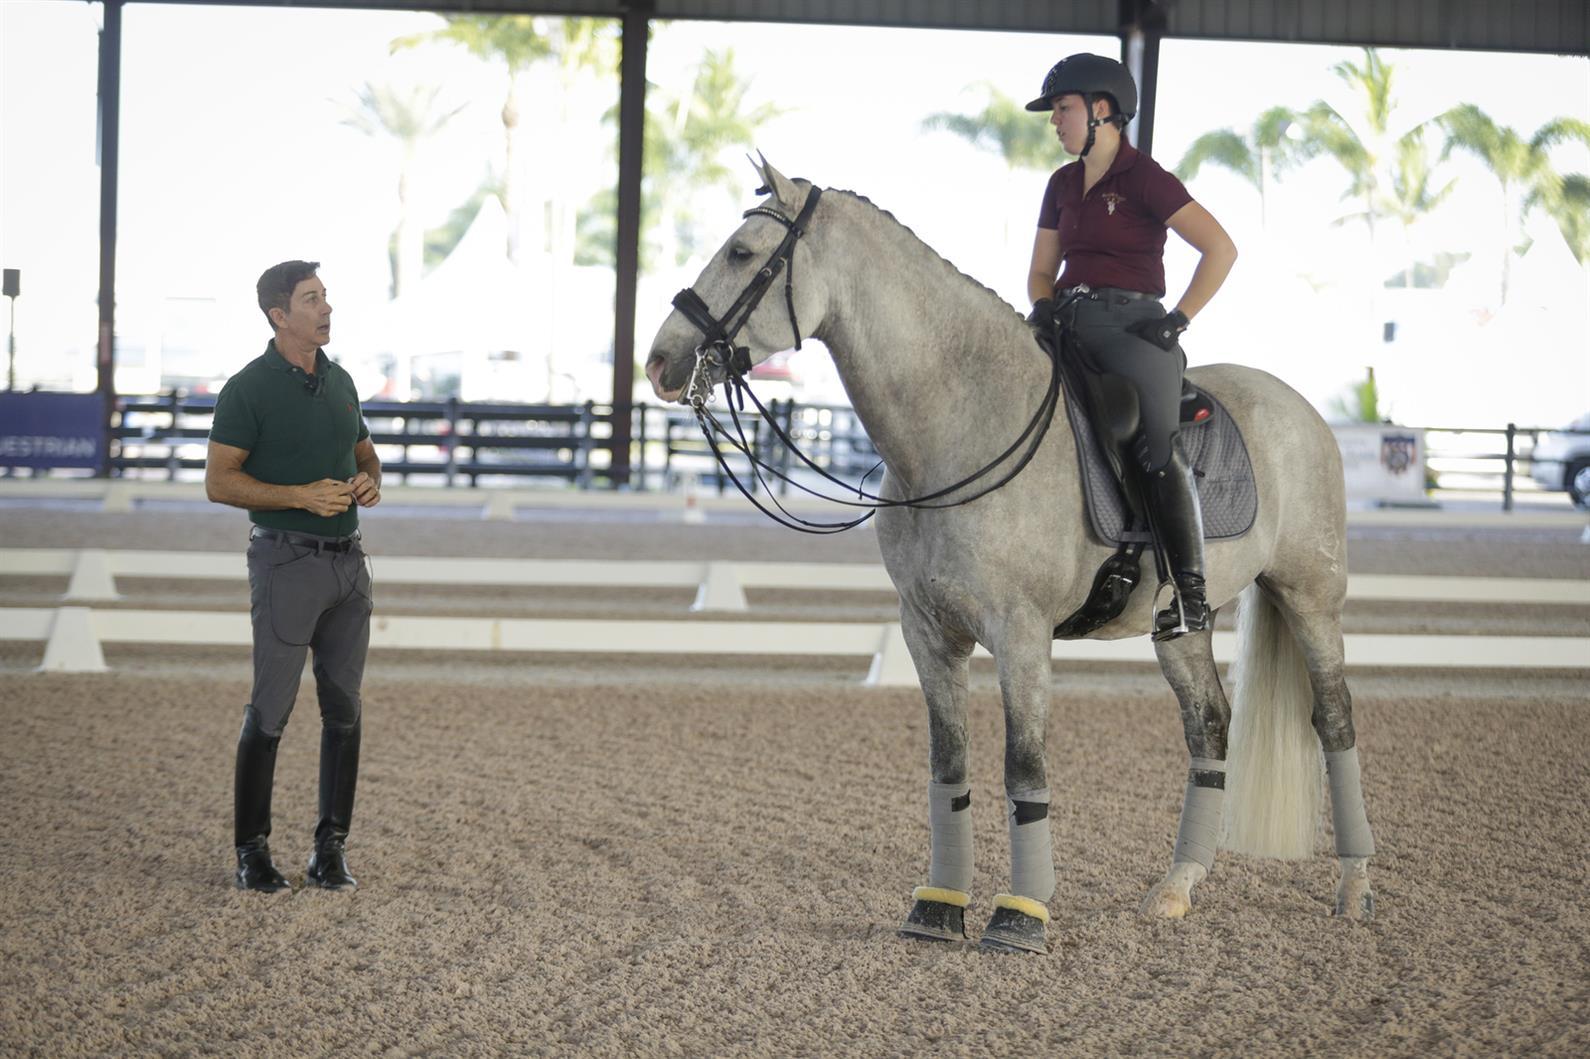 Robert Dover coaches Kerrigan Gluch during the Robert Dover Horsemastership Clinic Week in Wellington, Florida.